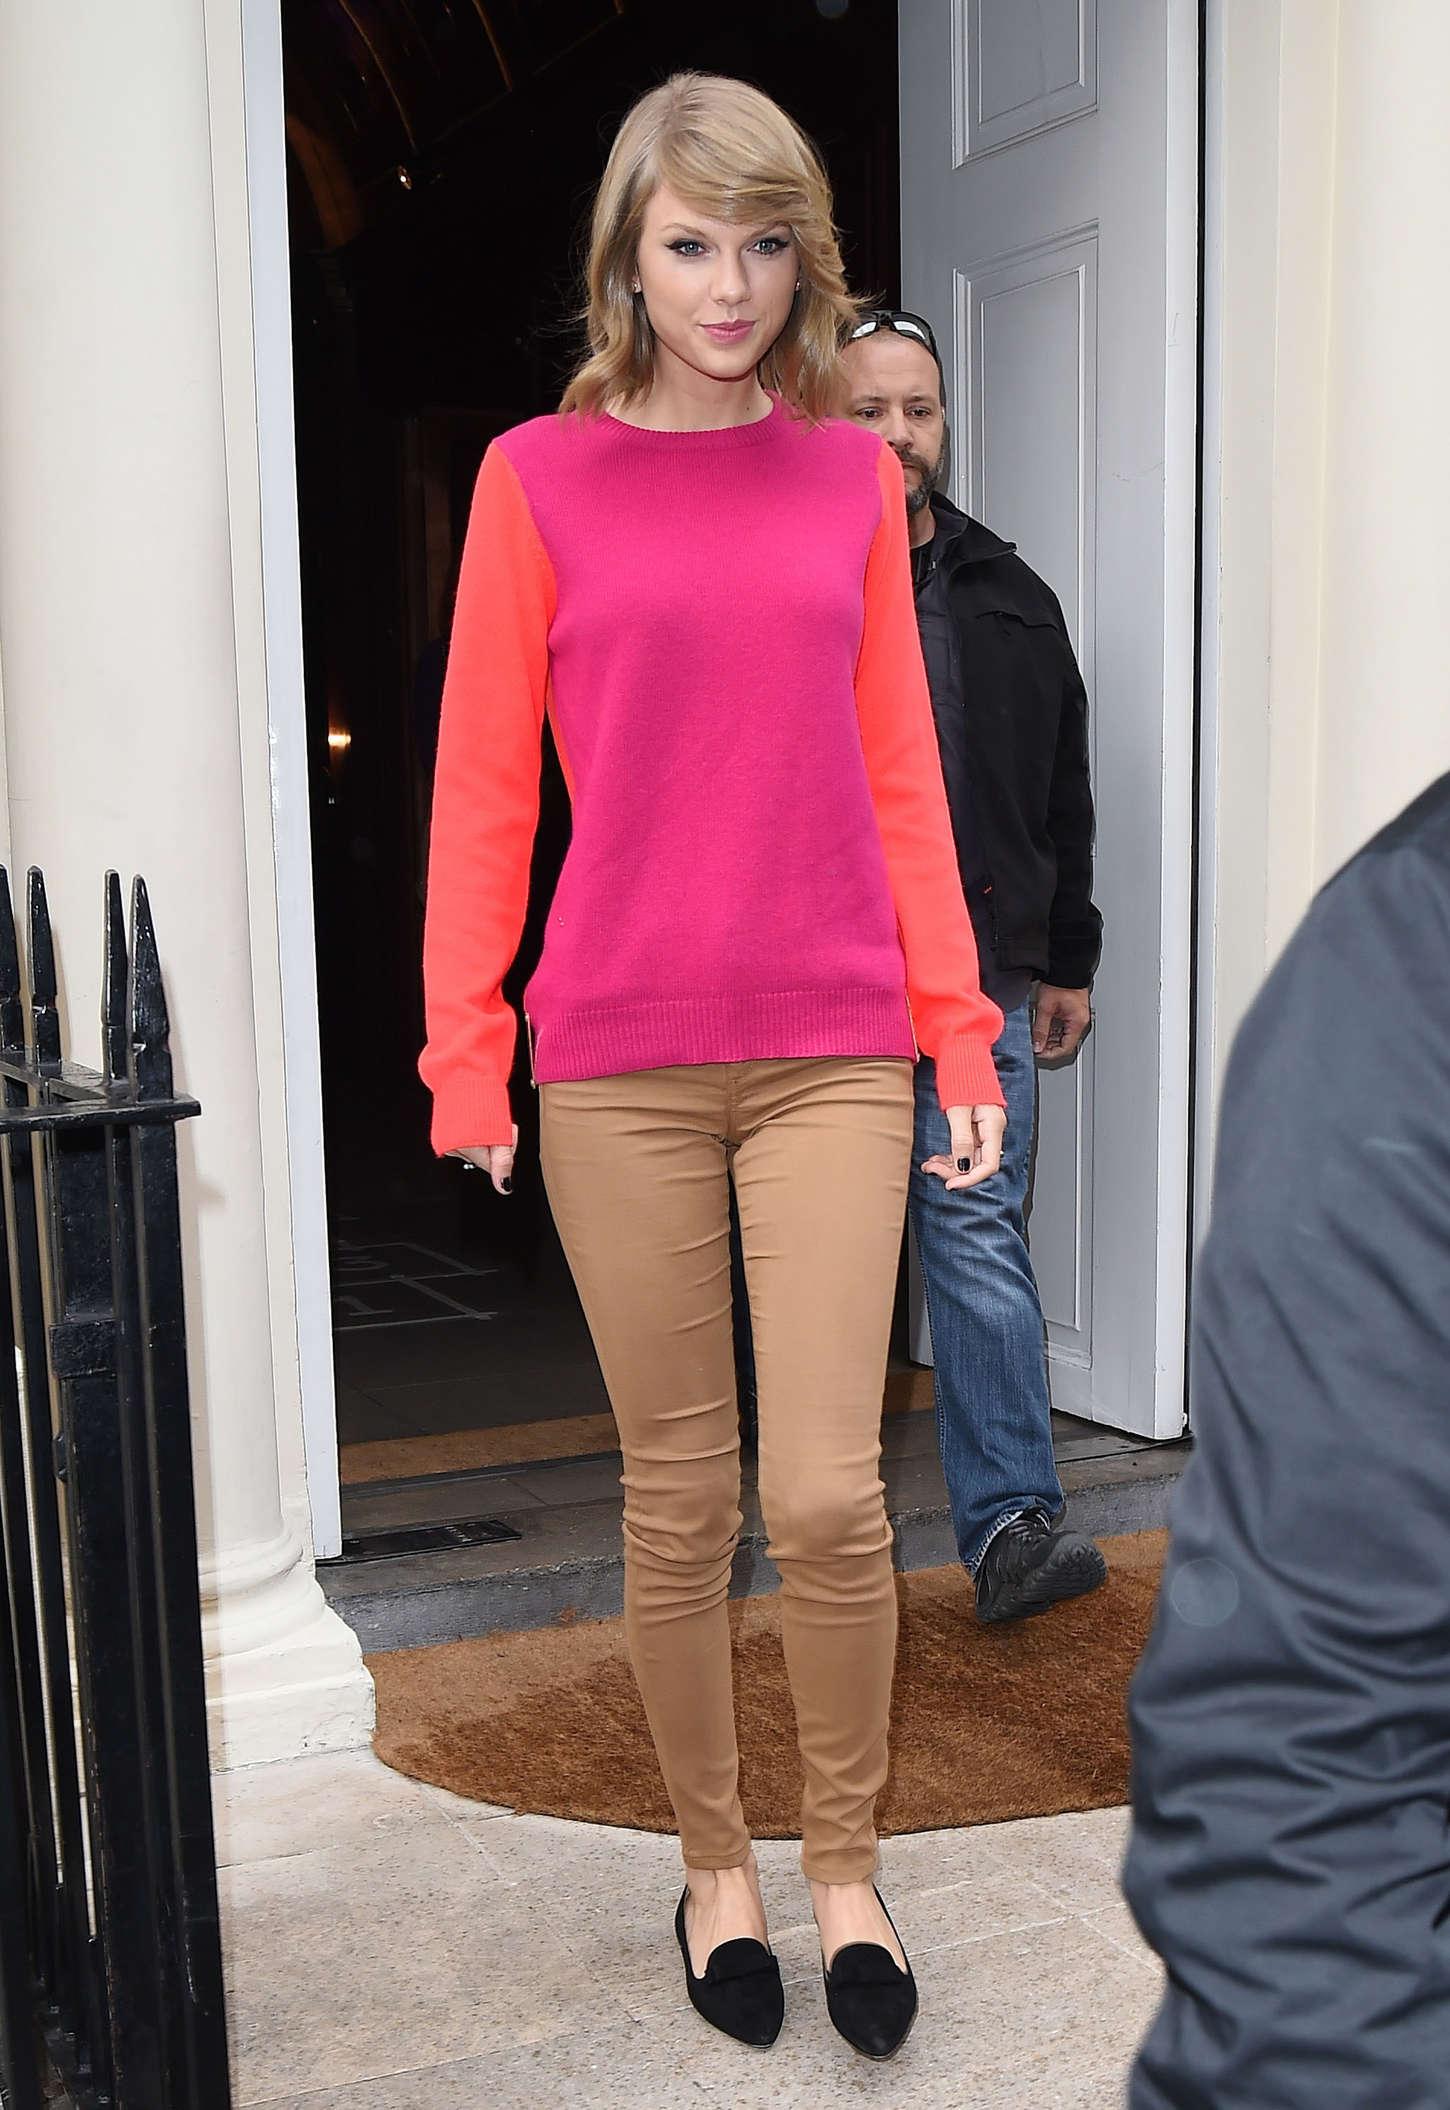 Black Swift Car Wallpapers Taylor Swift Leaving Sketch Restaurant In London